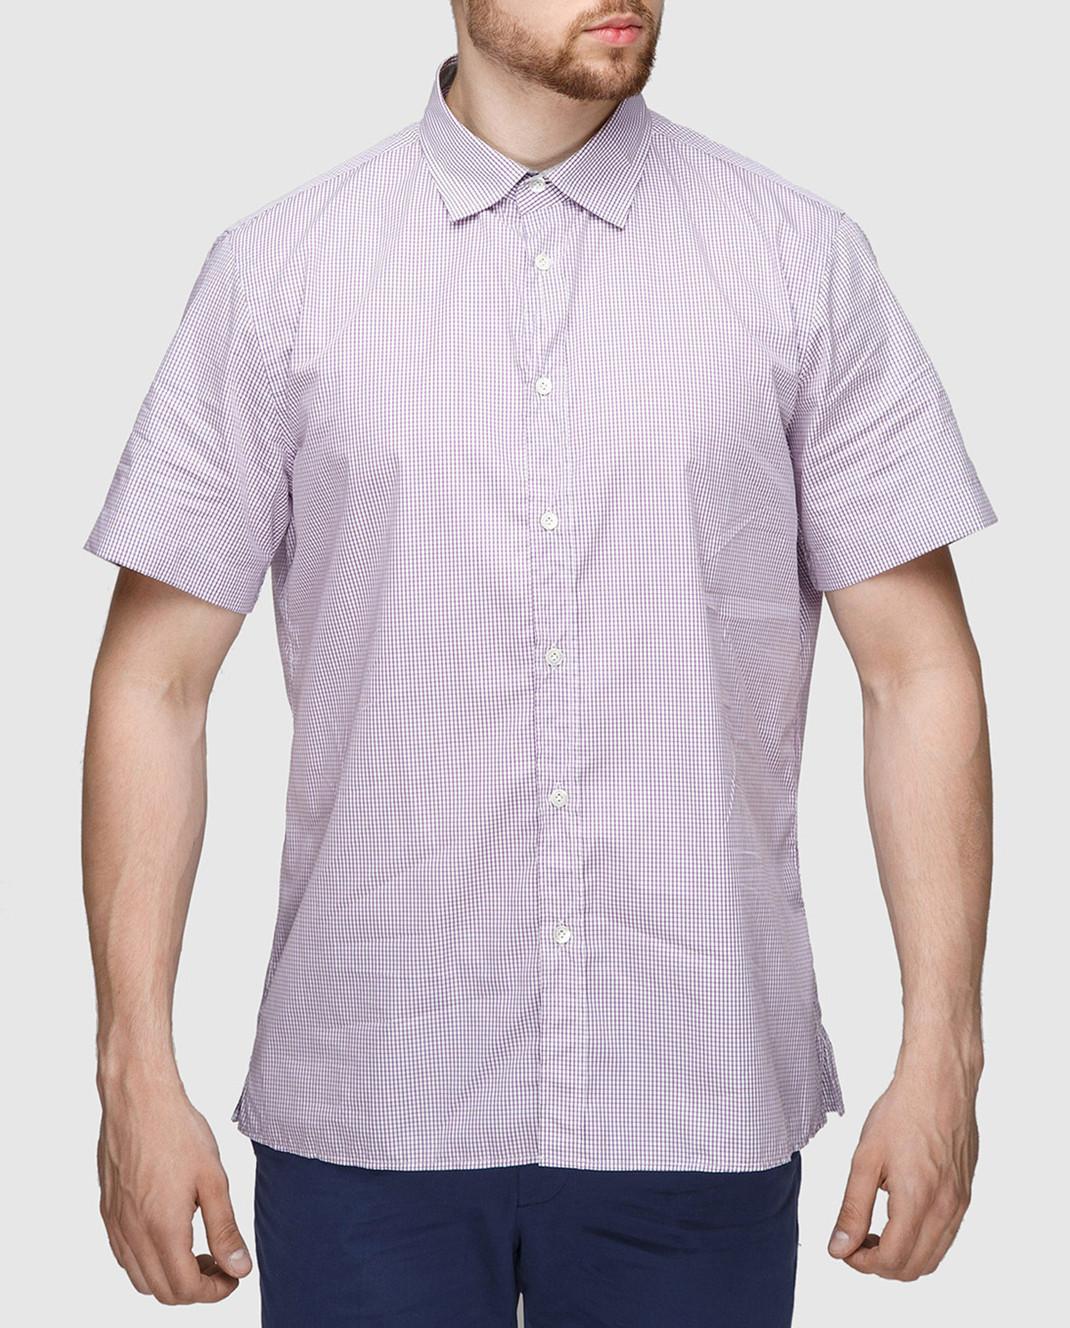 Luciano Barbera Сиреневая рубашка R10559071230 изображение 3